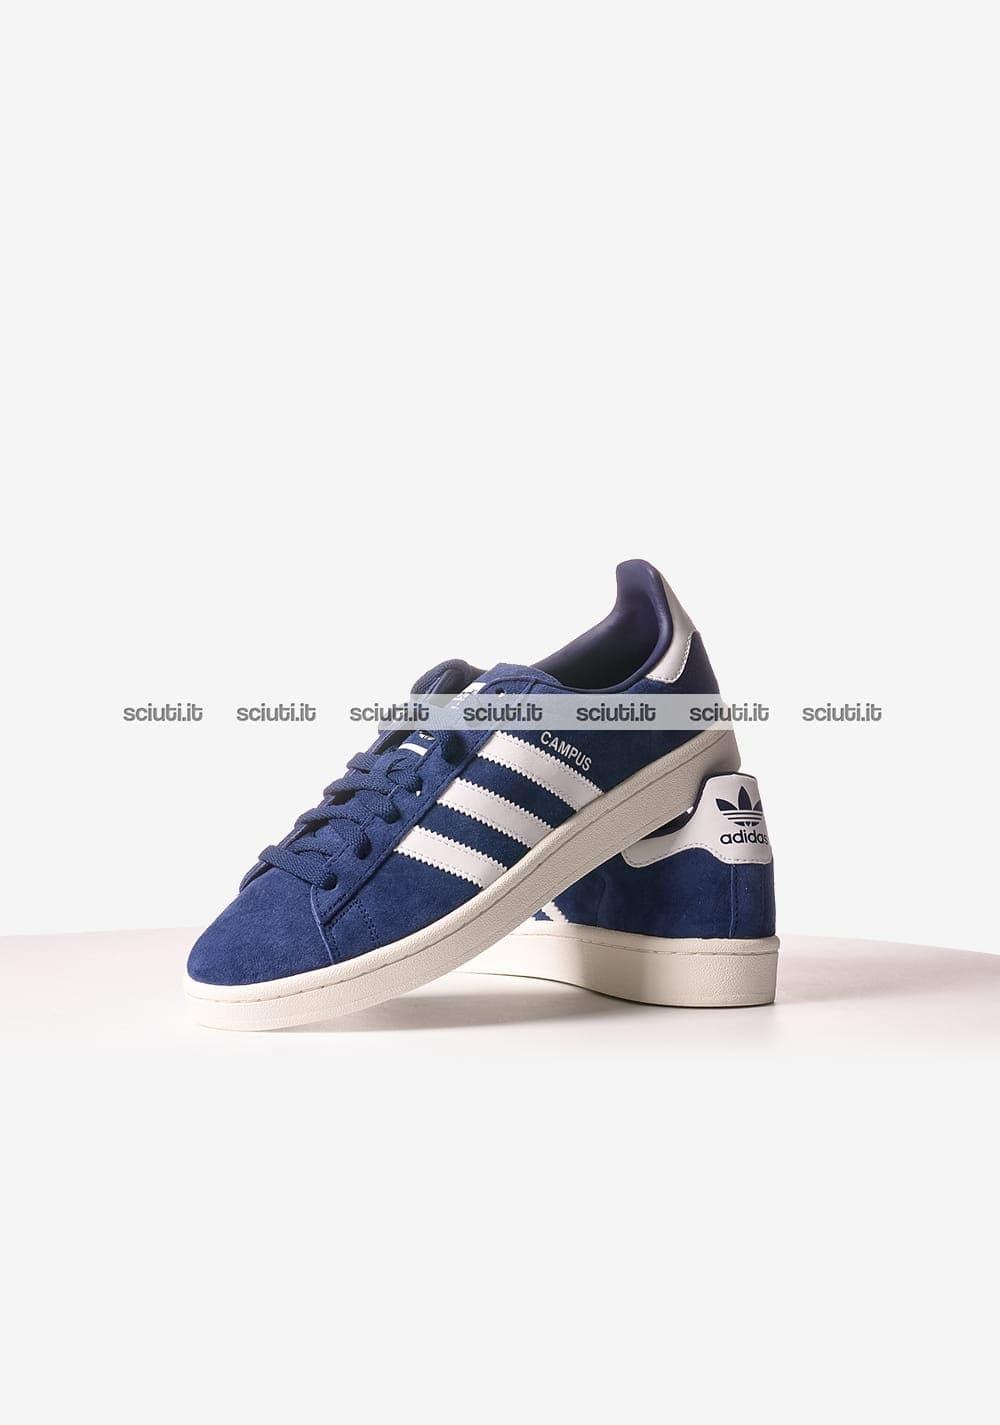 wholesale dealer 00c18 3db4a adidas campus blu uomo